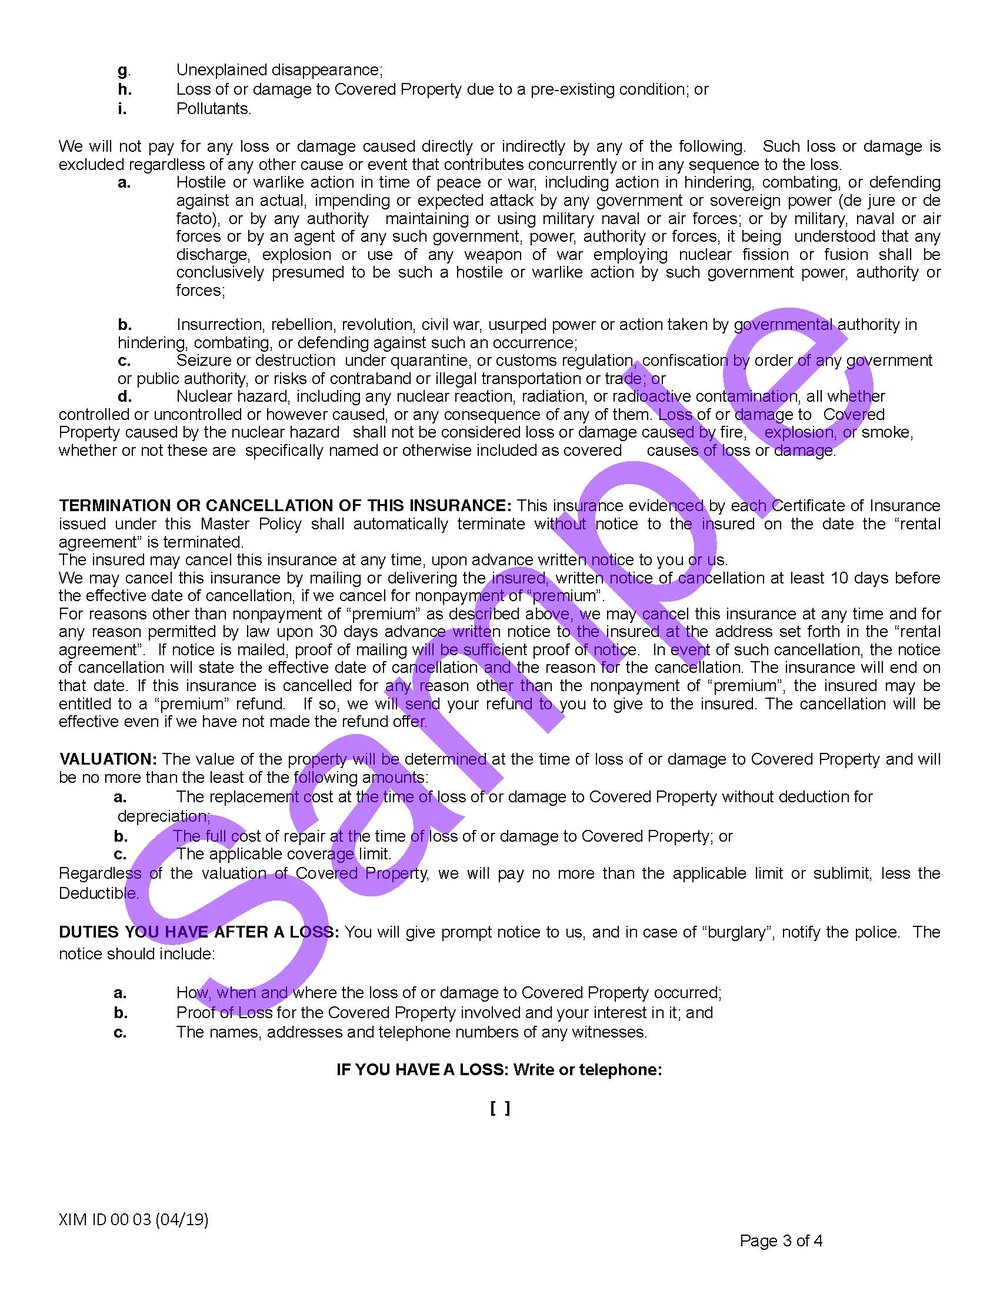 XIM ID 00 03 04 19 Idaho Certificate of InsuranceSample_Page_3.jpg